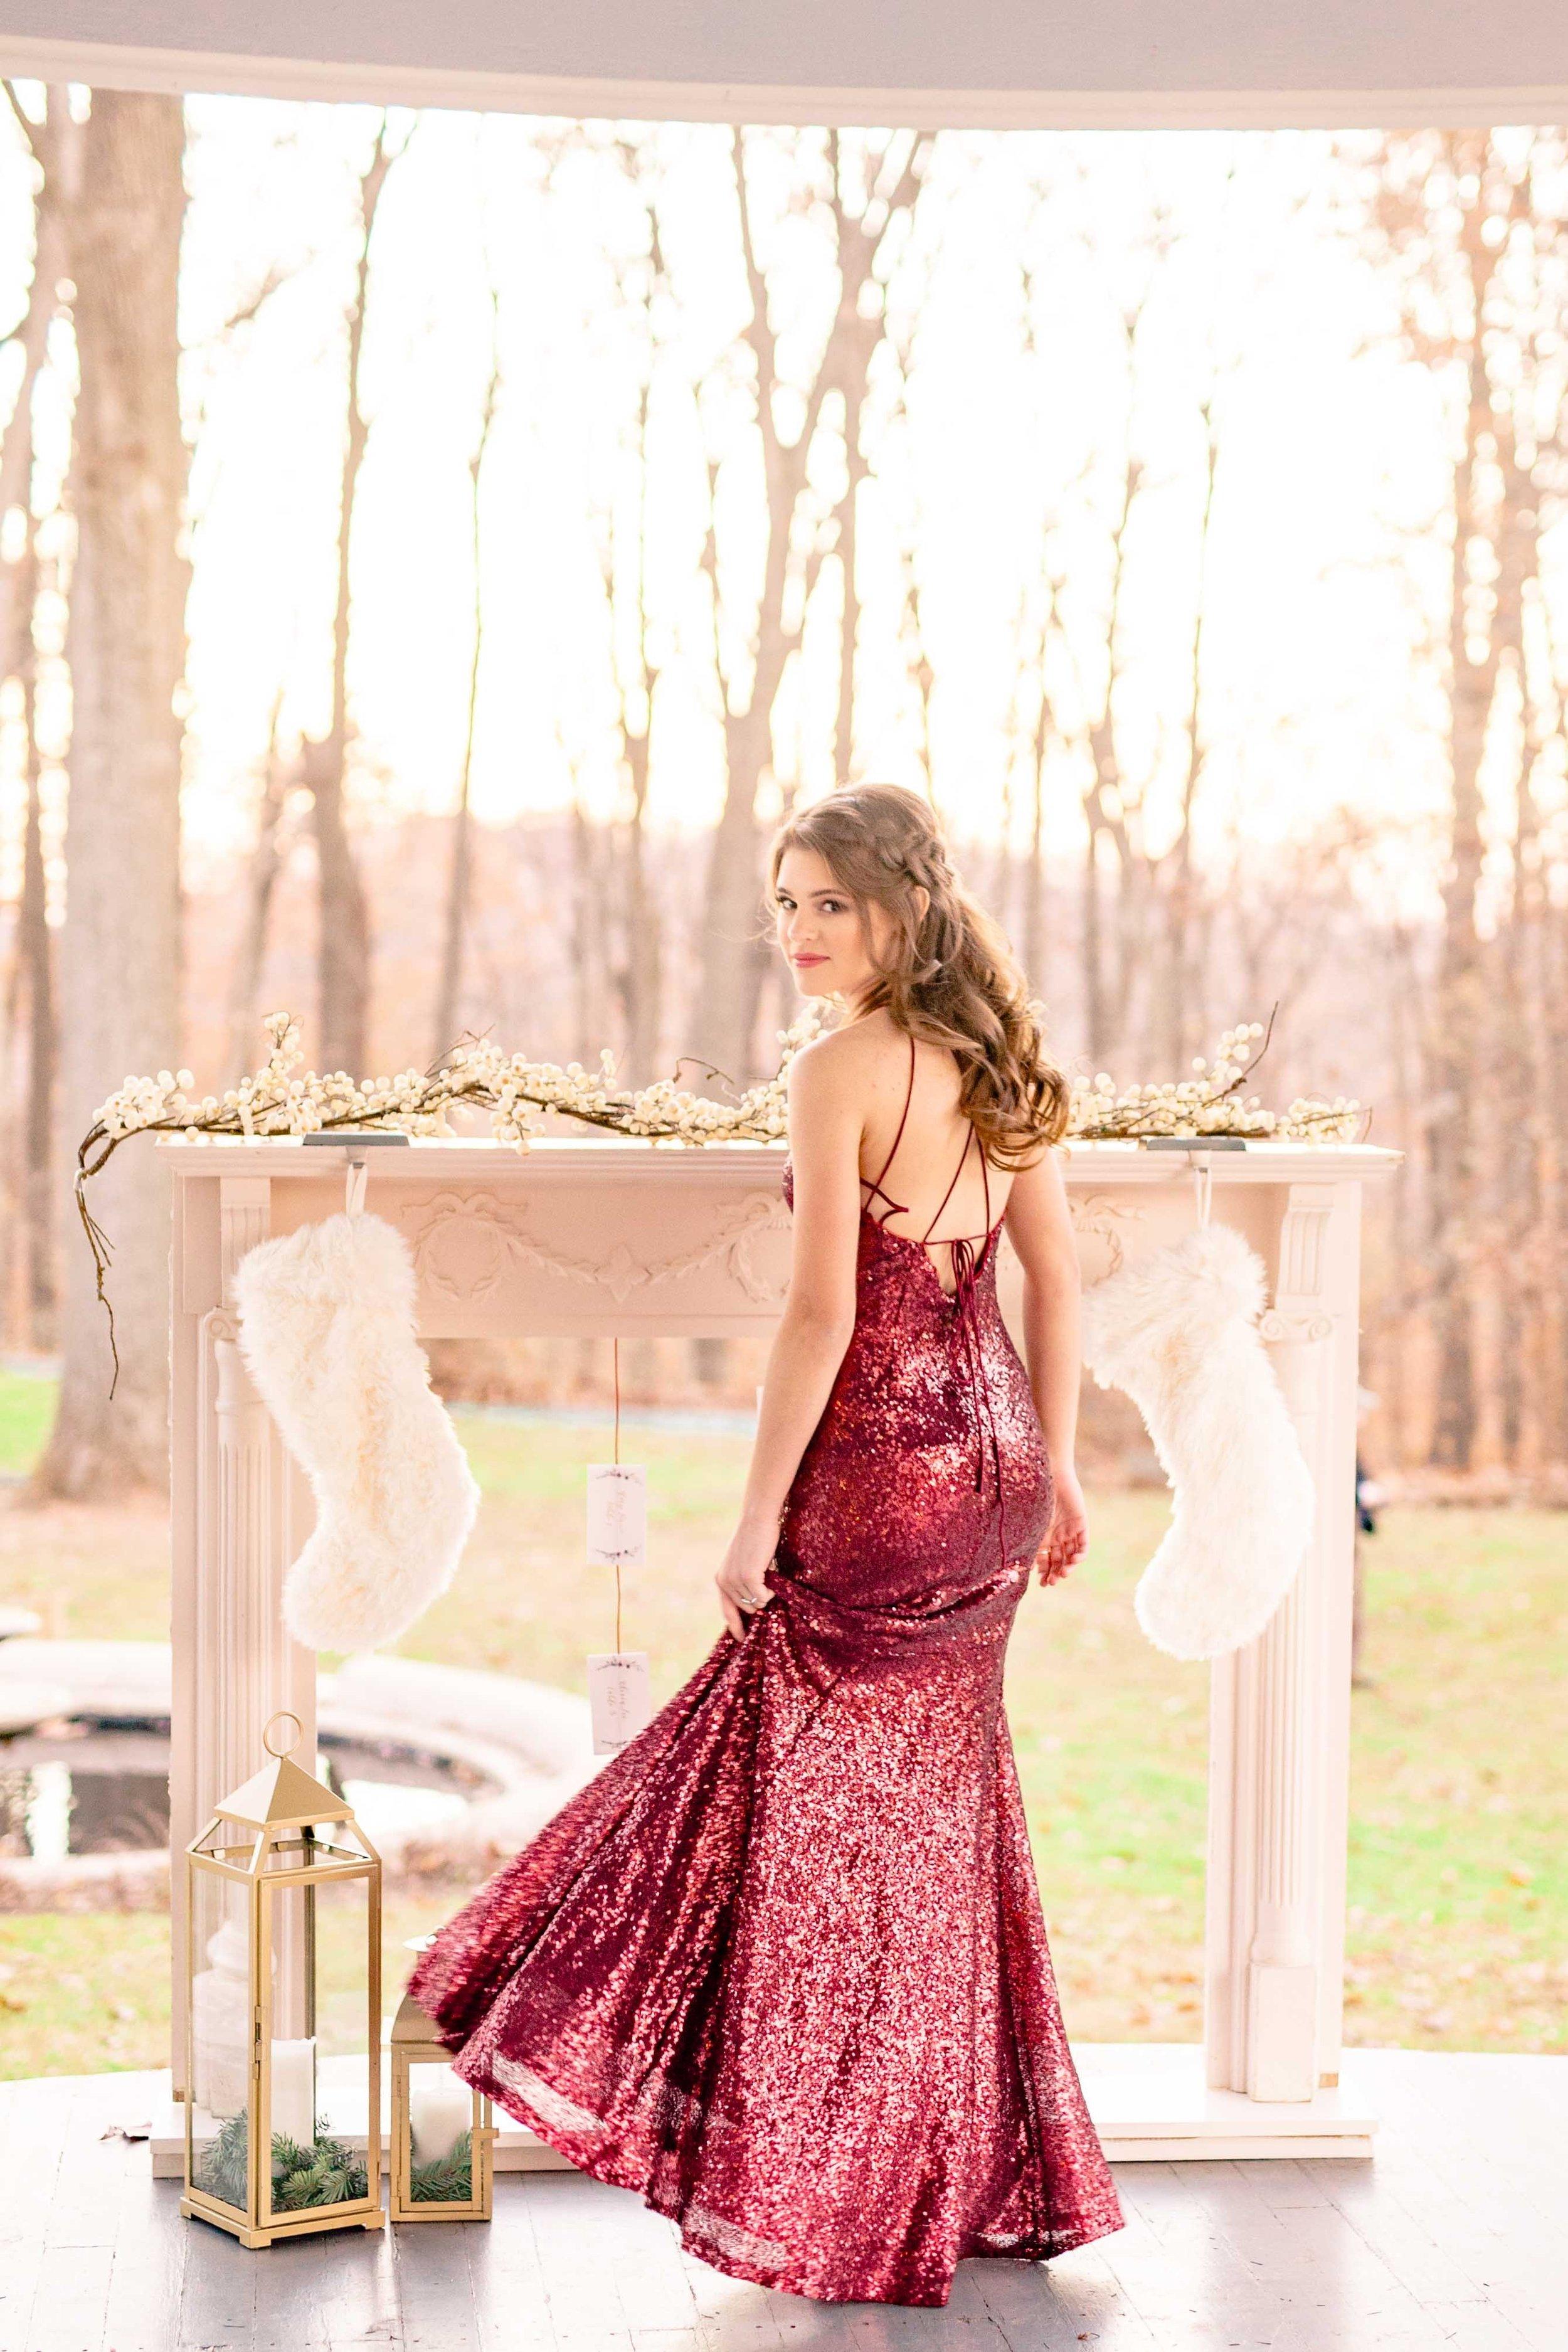 Holiday-Styled-Shoot-Amanda-MacPhee-825.jpg